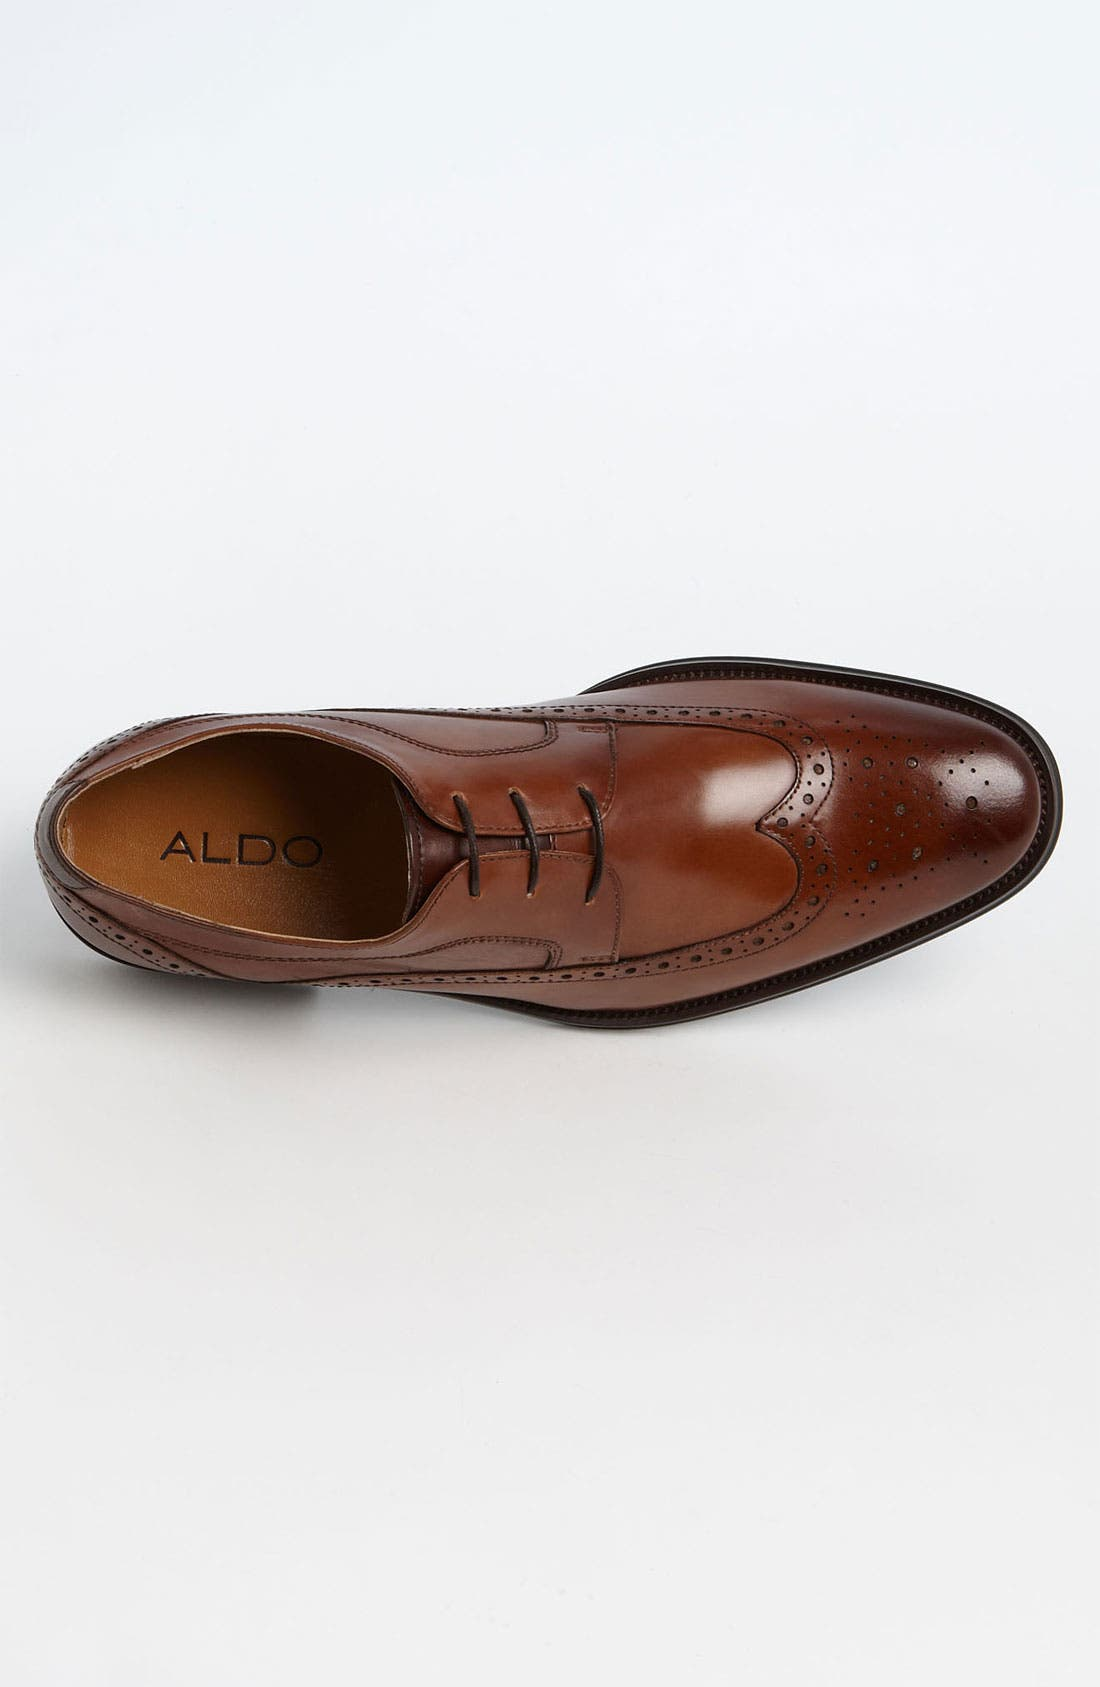 Alternate Image 3  - ALDO 'Brownlie' Wingtip Oxford